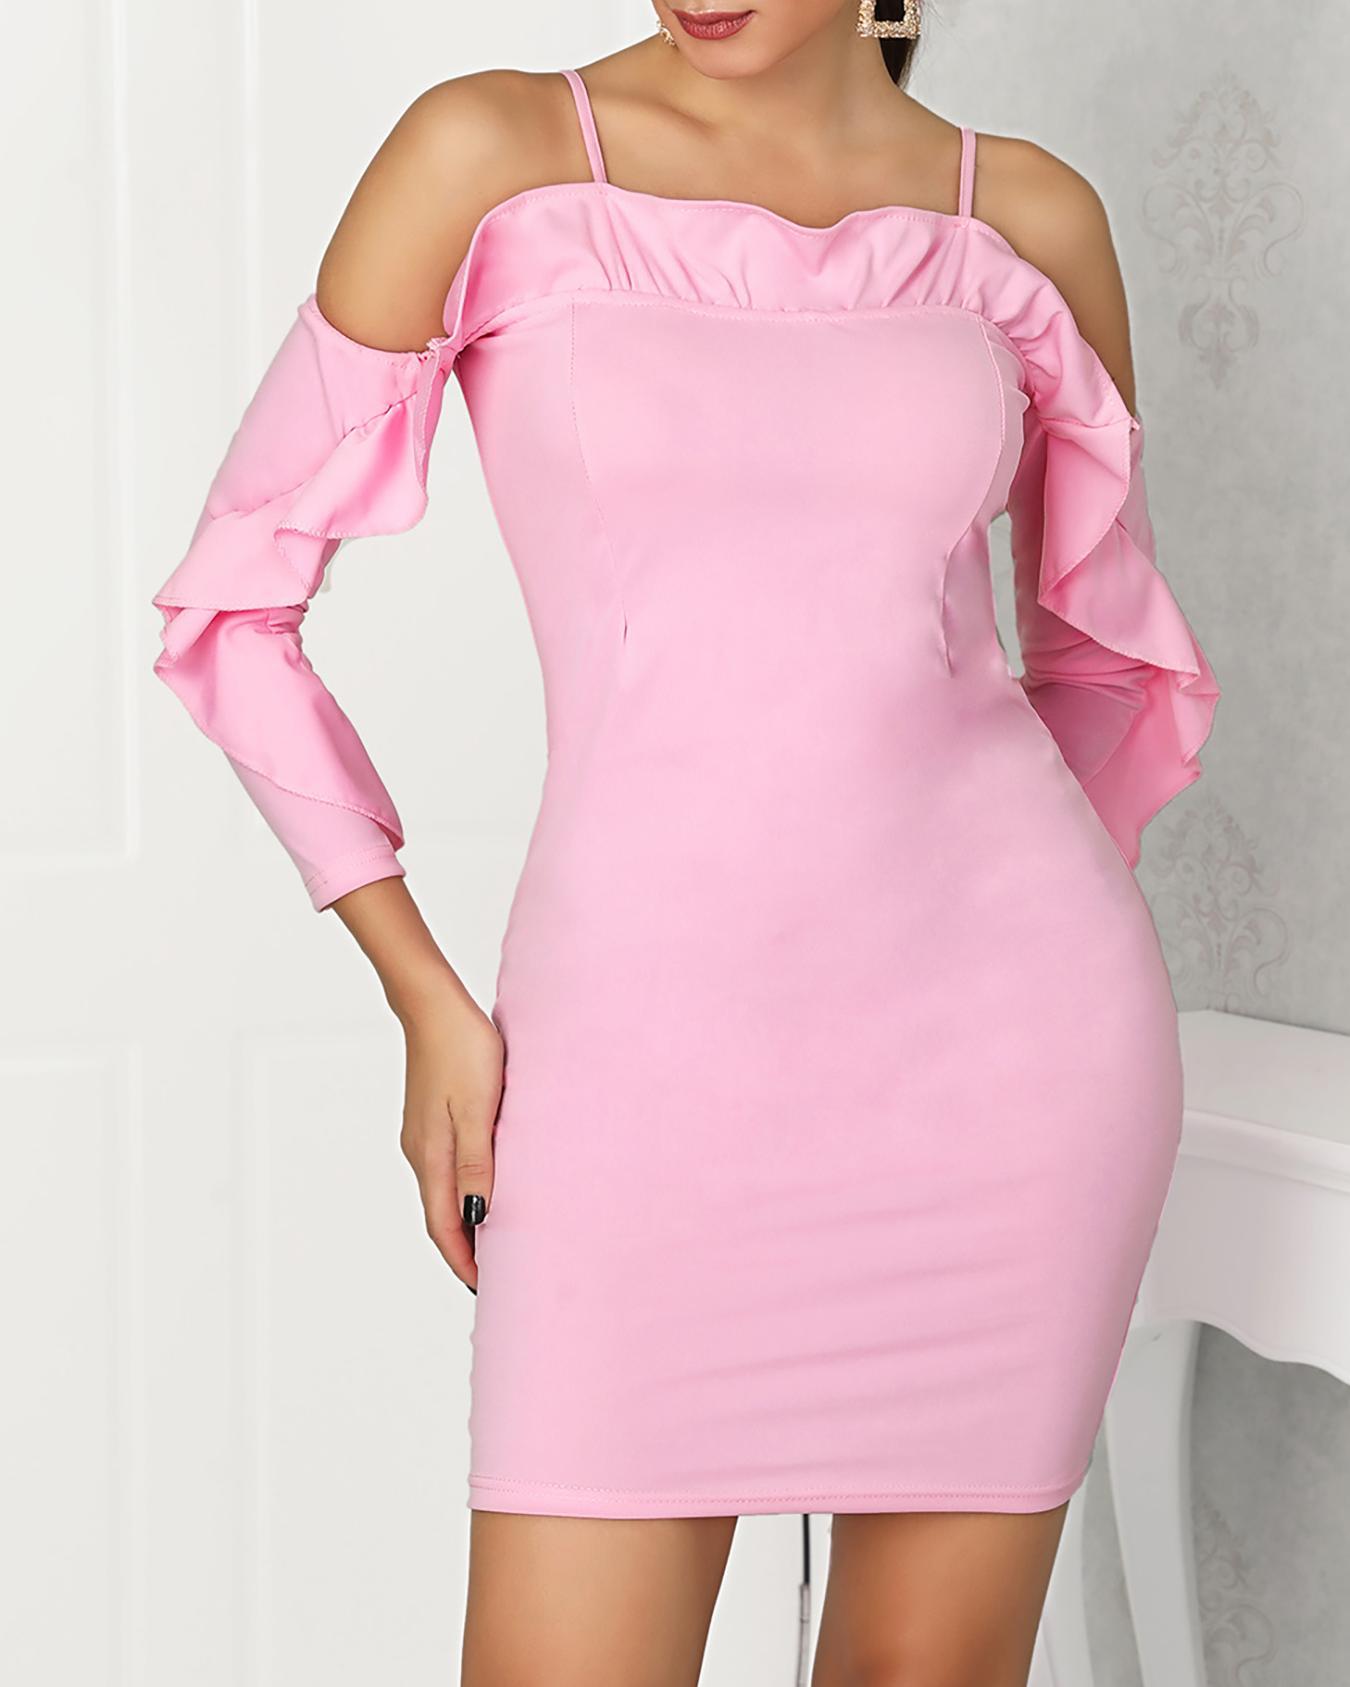 Cold Shoulder Ruffle Trim Bodycon Dress